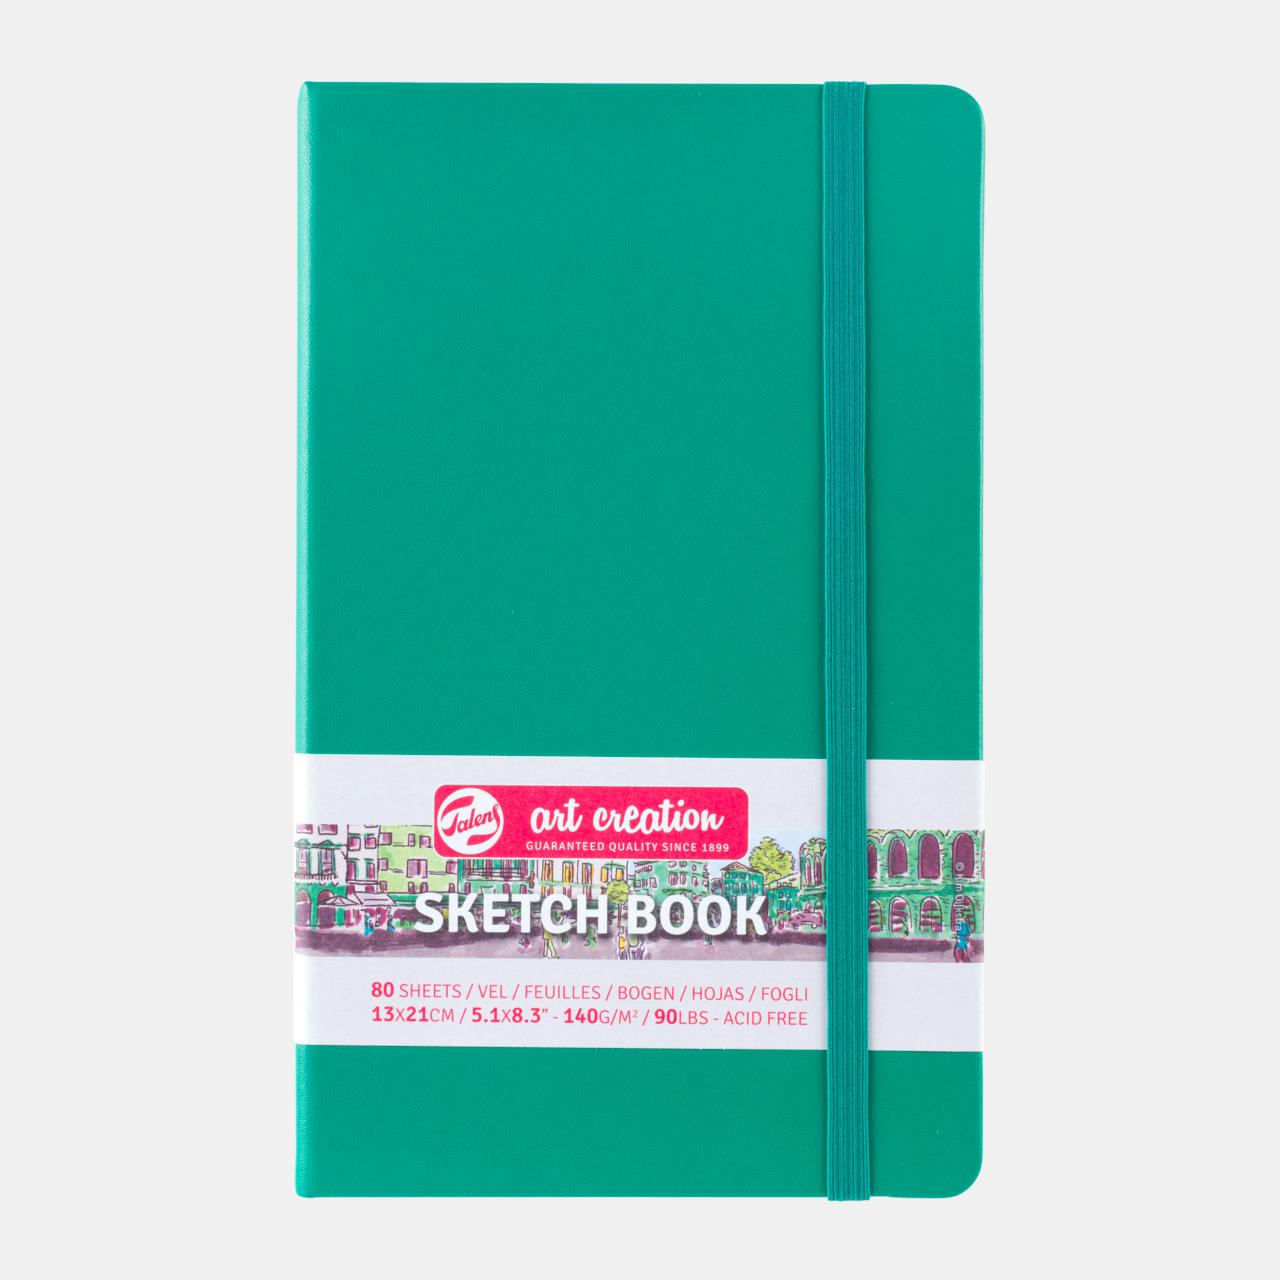 Sketch book green 13x21cm